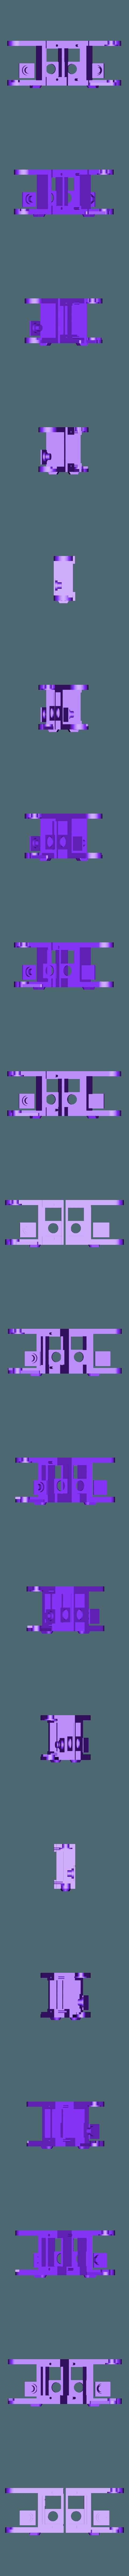 m-coxa.stl Download free STL file Ez Arduino Spidey - 12 DOF Quadruped Robot • 3D printing object, manic-3d-print